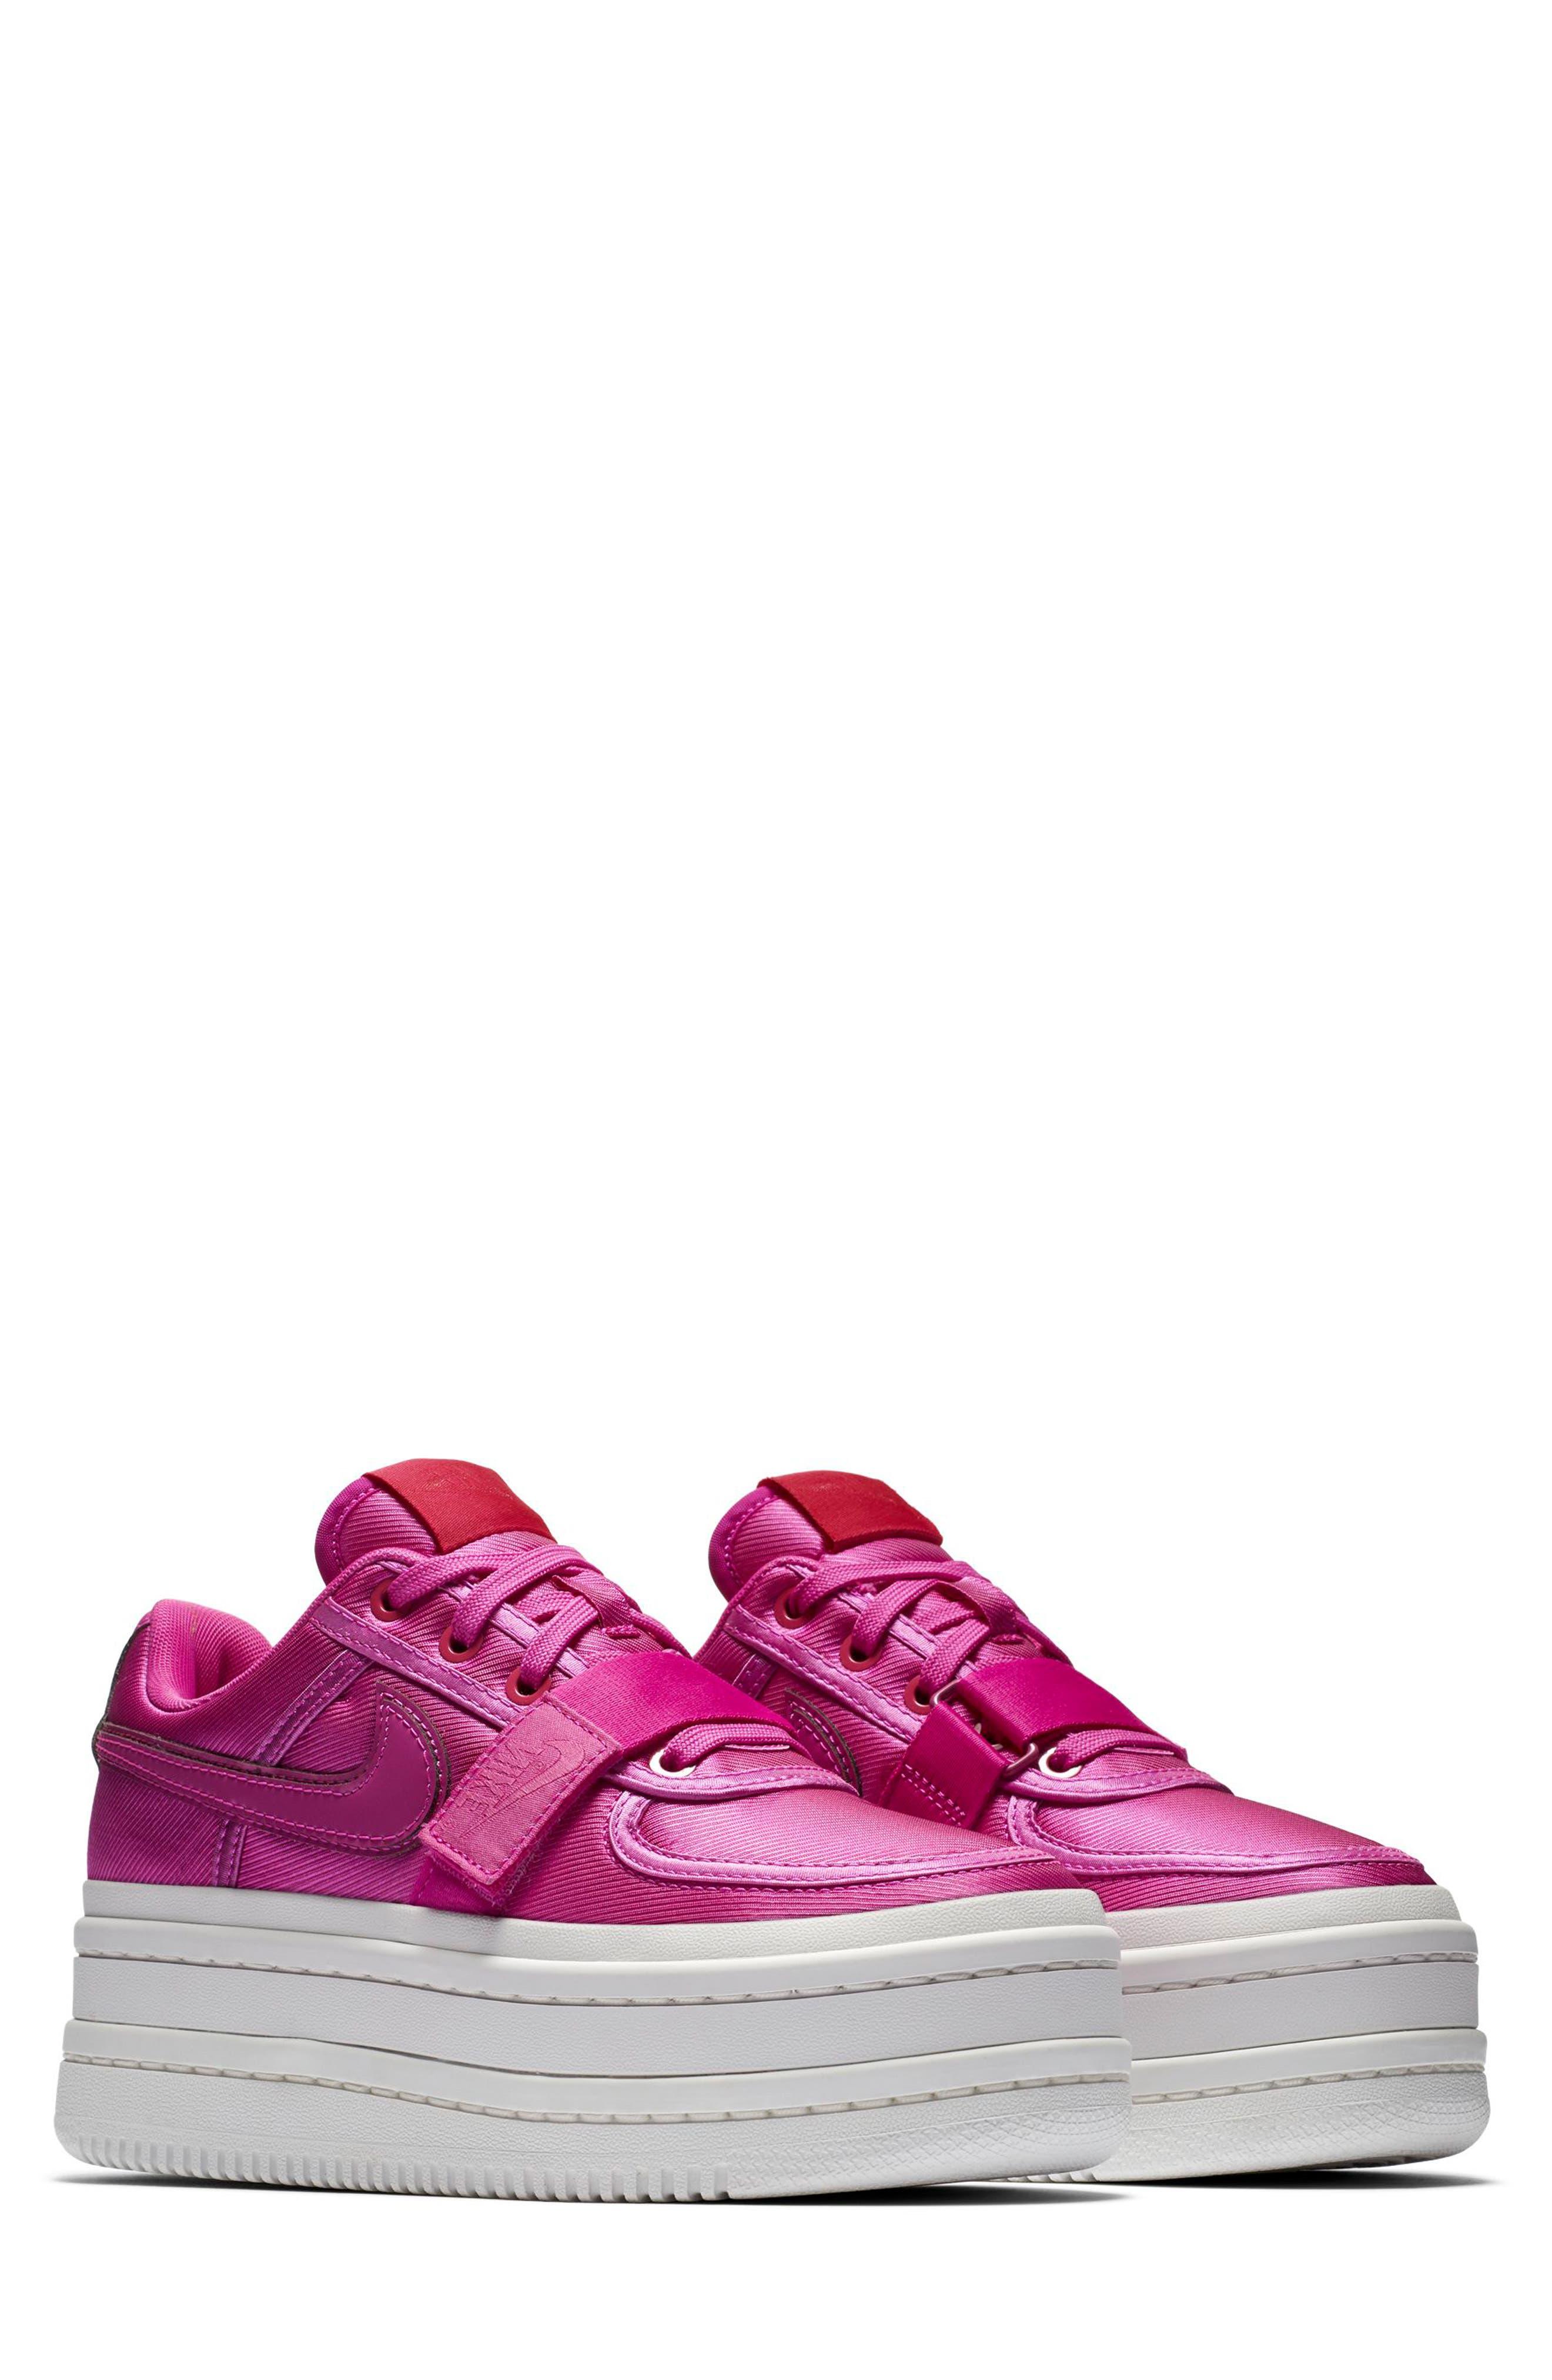 Nike Vandal 2k Sneaker In Hyper Magenta